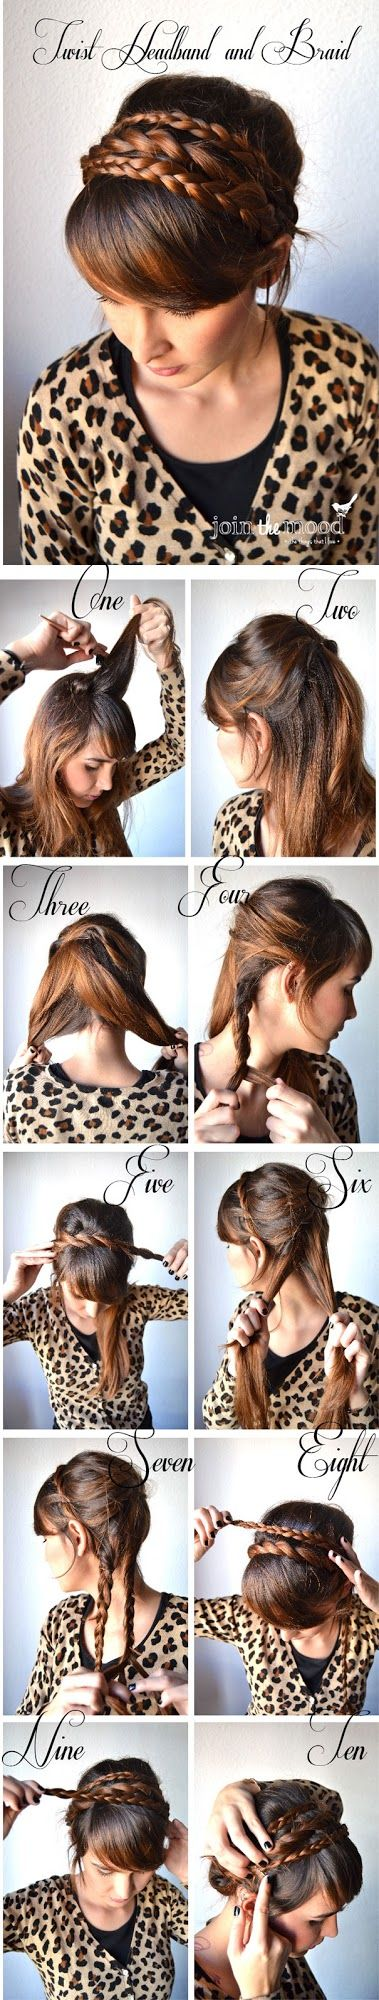 Make Wist Headband And Braid   Beauty tutorials